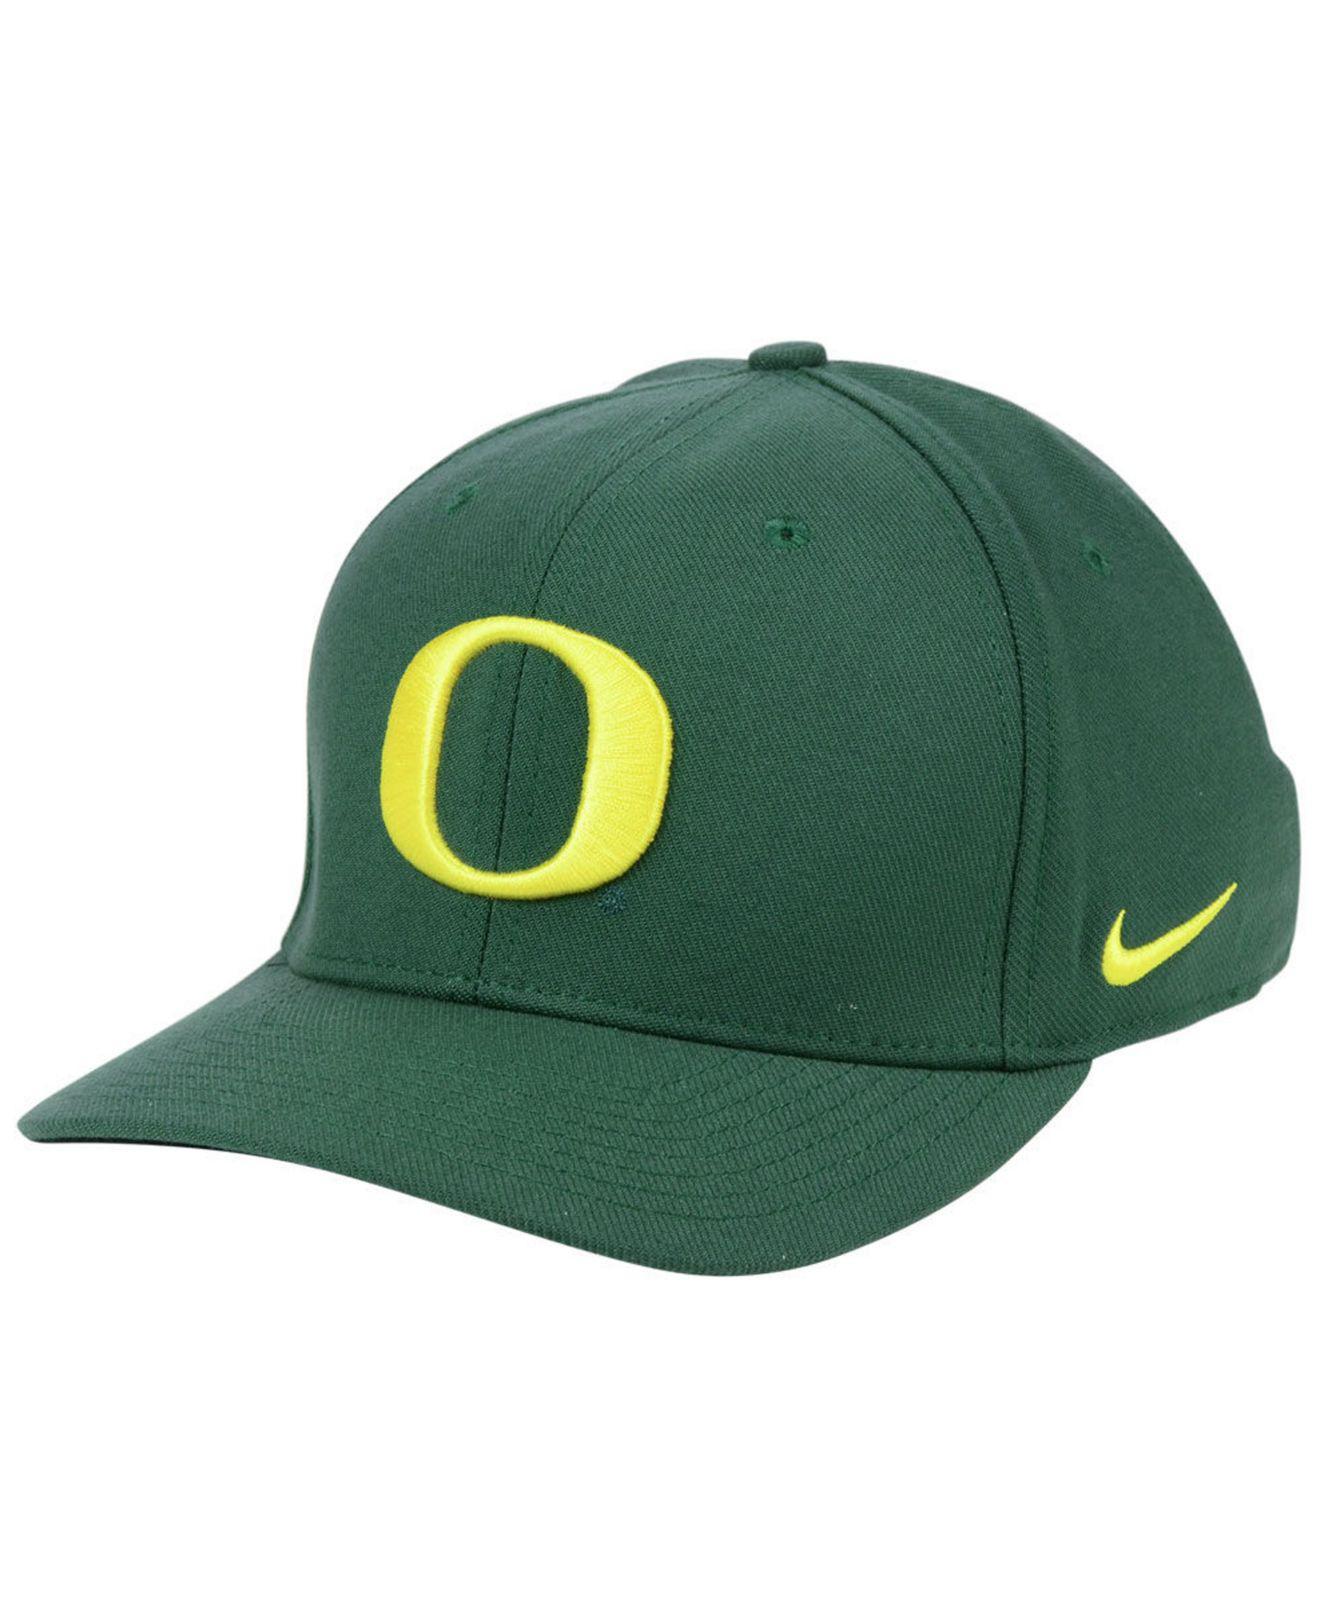 649d2b9ea12 Lyst - Nike Oregon Ducks Col Dri-fit Wool Cap in Green for Men